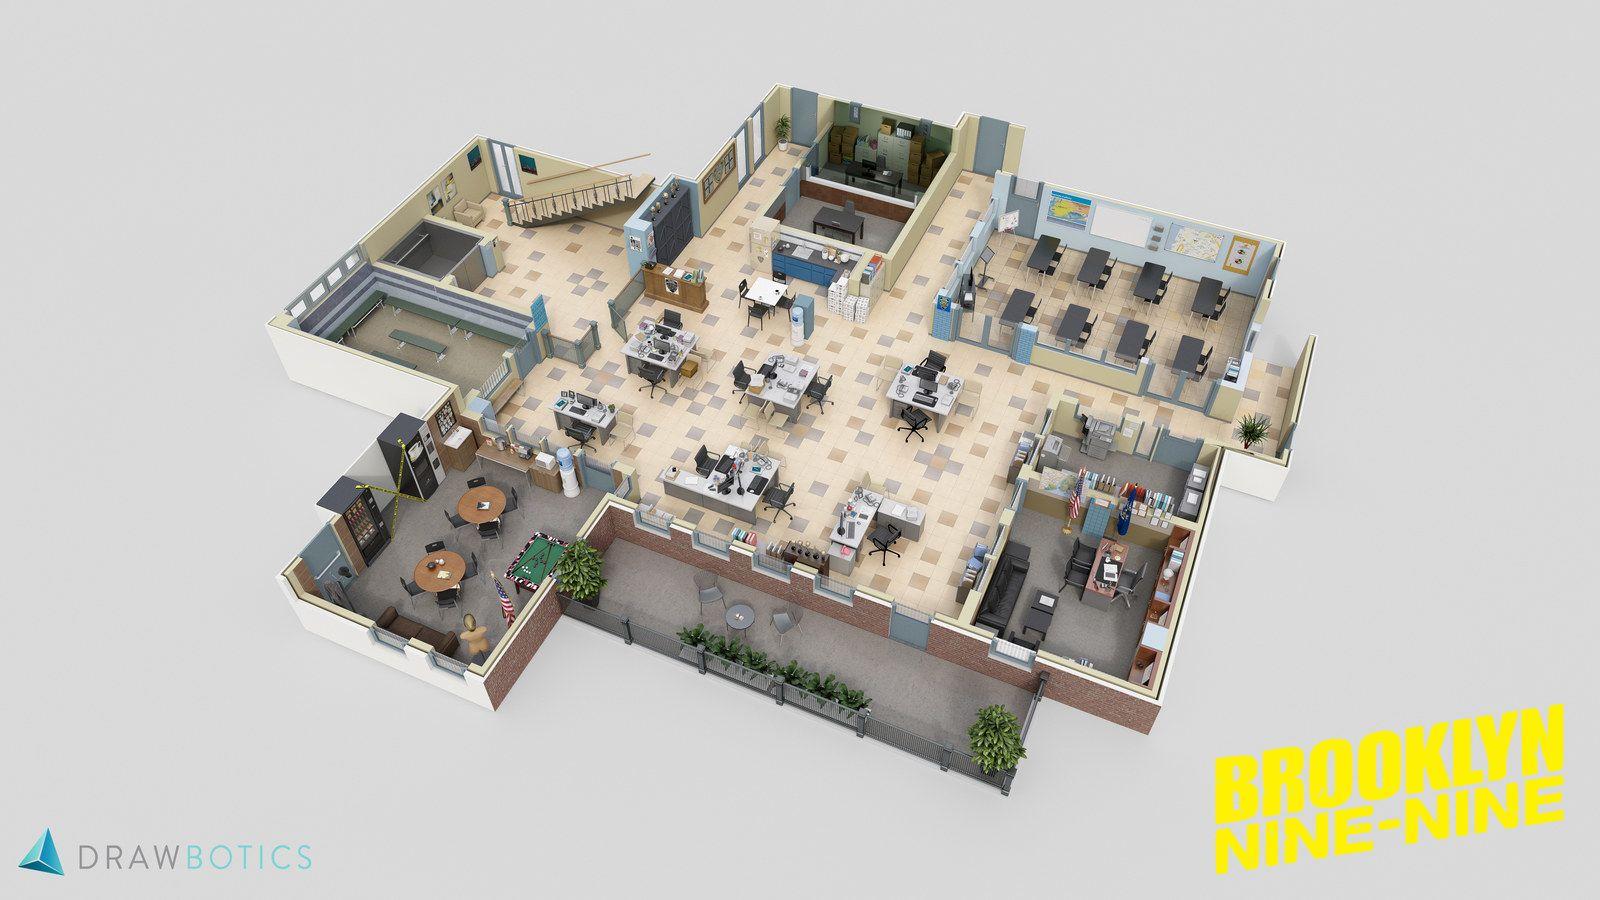 7 Incredibly Detailed 3d Floor Plans Of Your Favorite Tv Shows Floor Plans Brooklyn Nine Nine Office Floor Plan